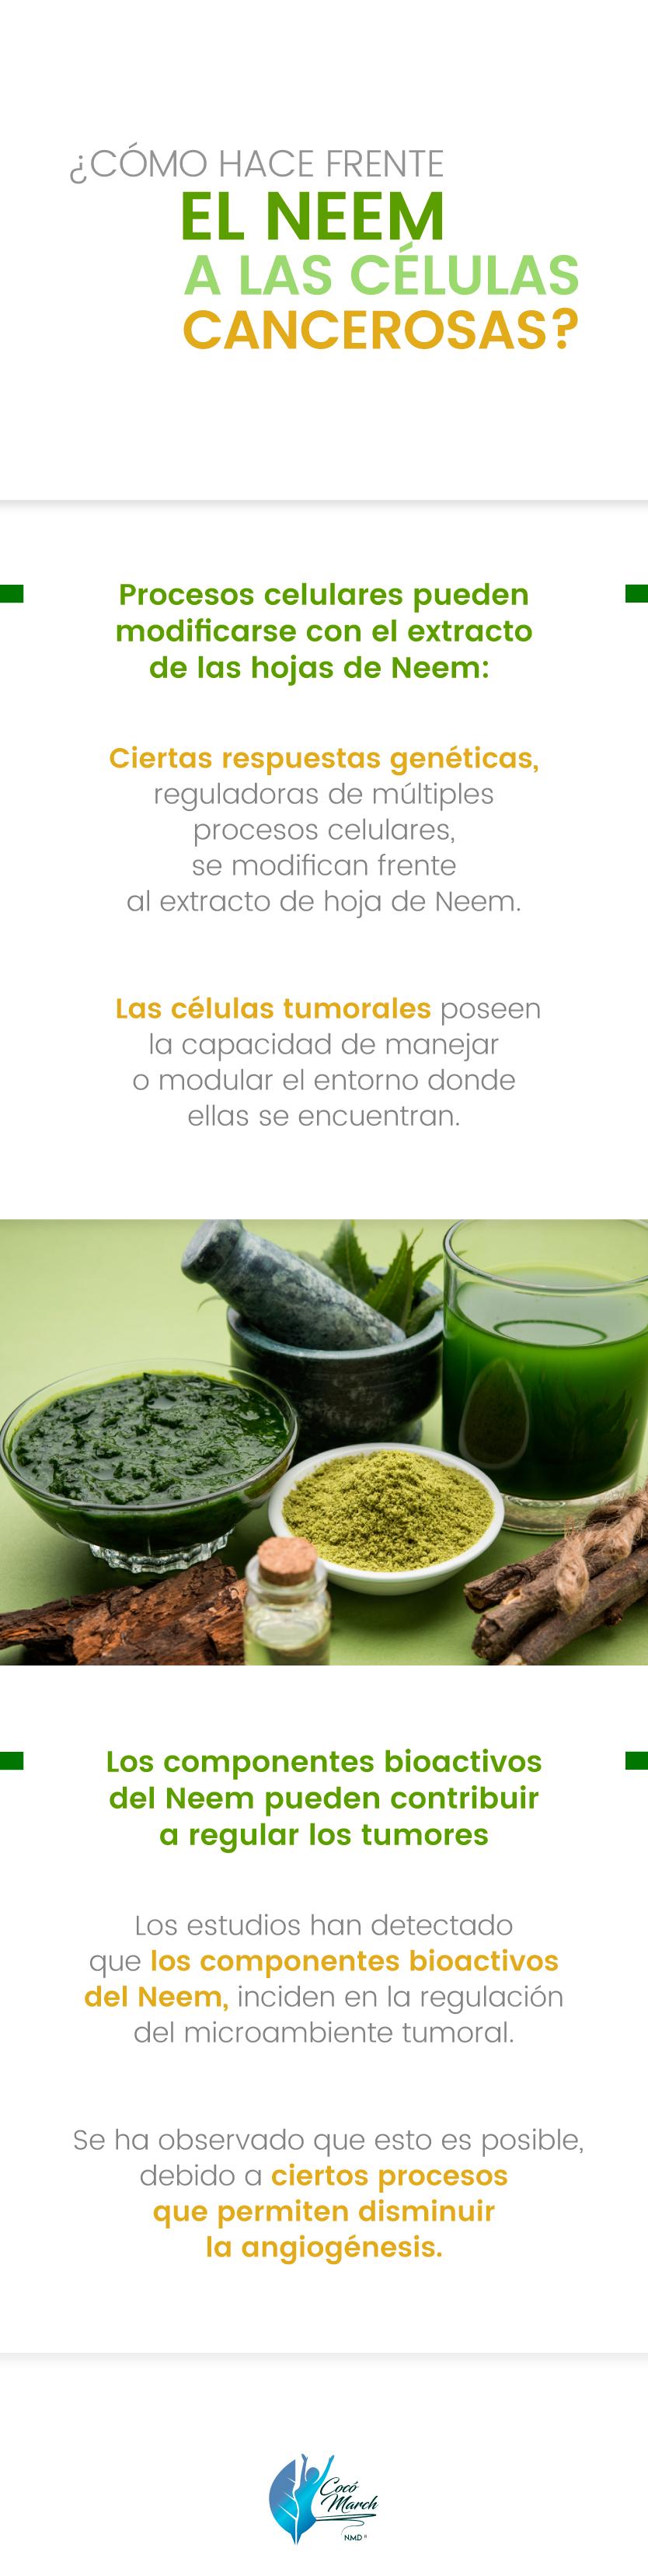 neem-y-celulas-cancerosas